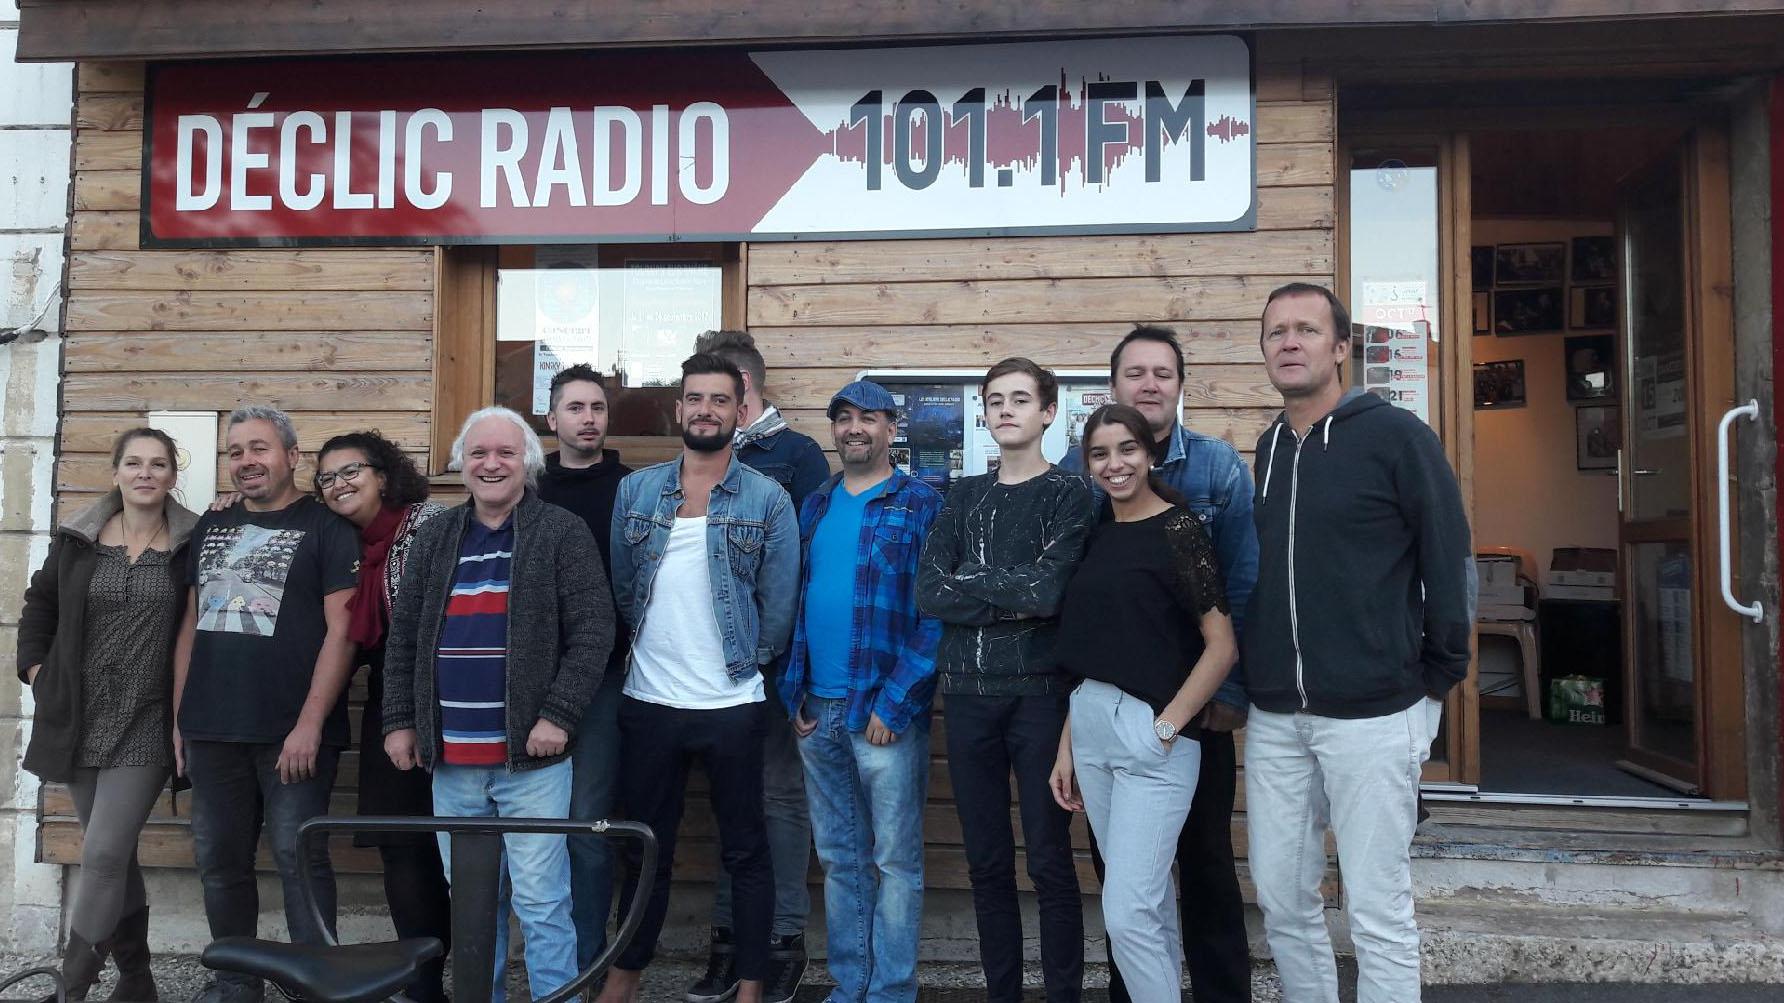 Bénévoles - Déclic Radio - Centre socioculturel de Tourno